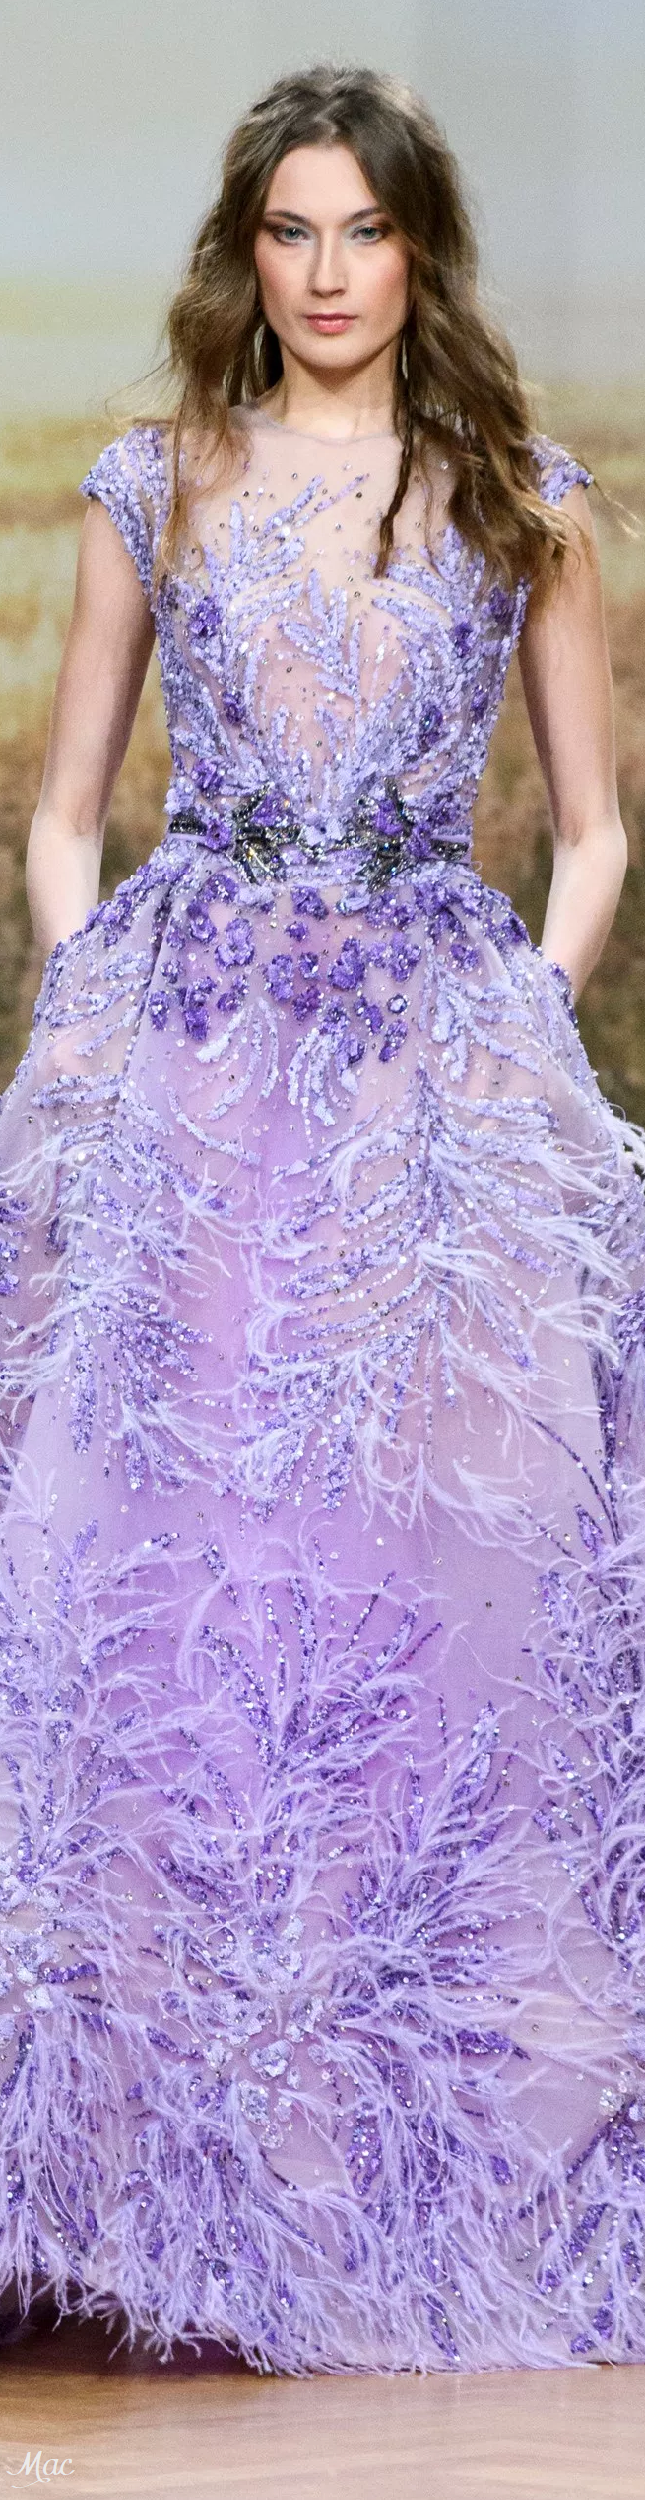 Spring 2018 Haute Couture Ziad Nakad | morado | Pinterest | Lilas ...